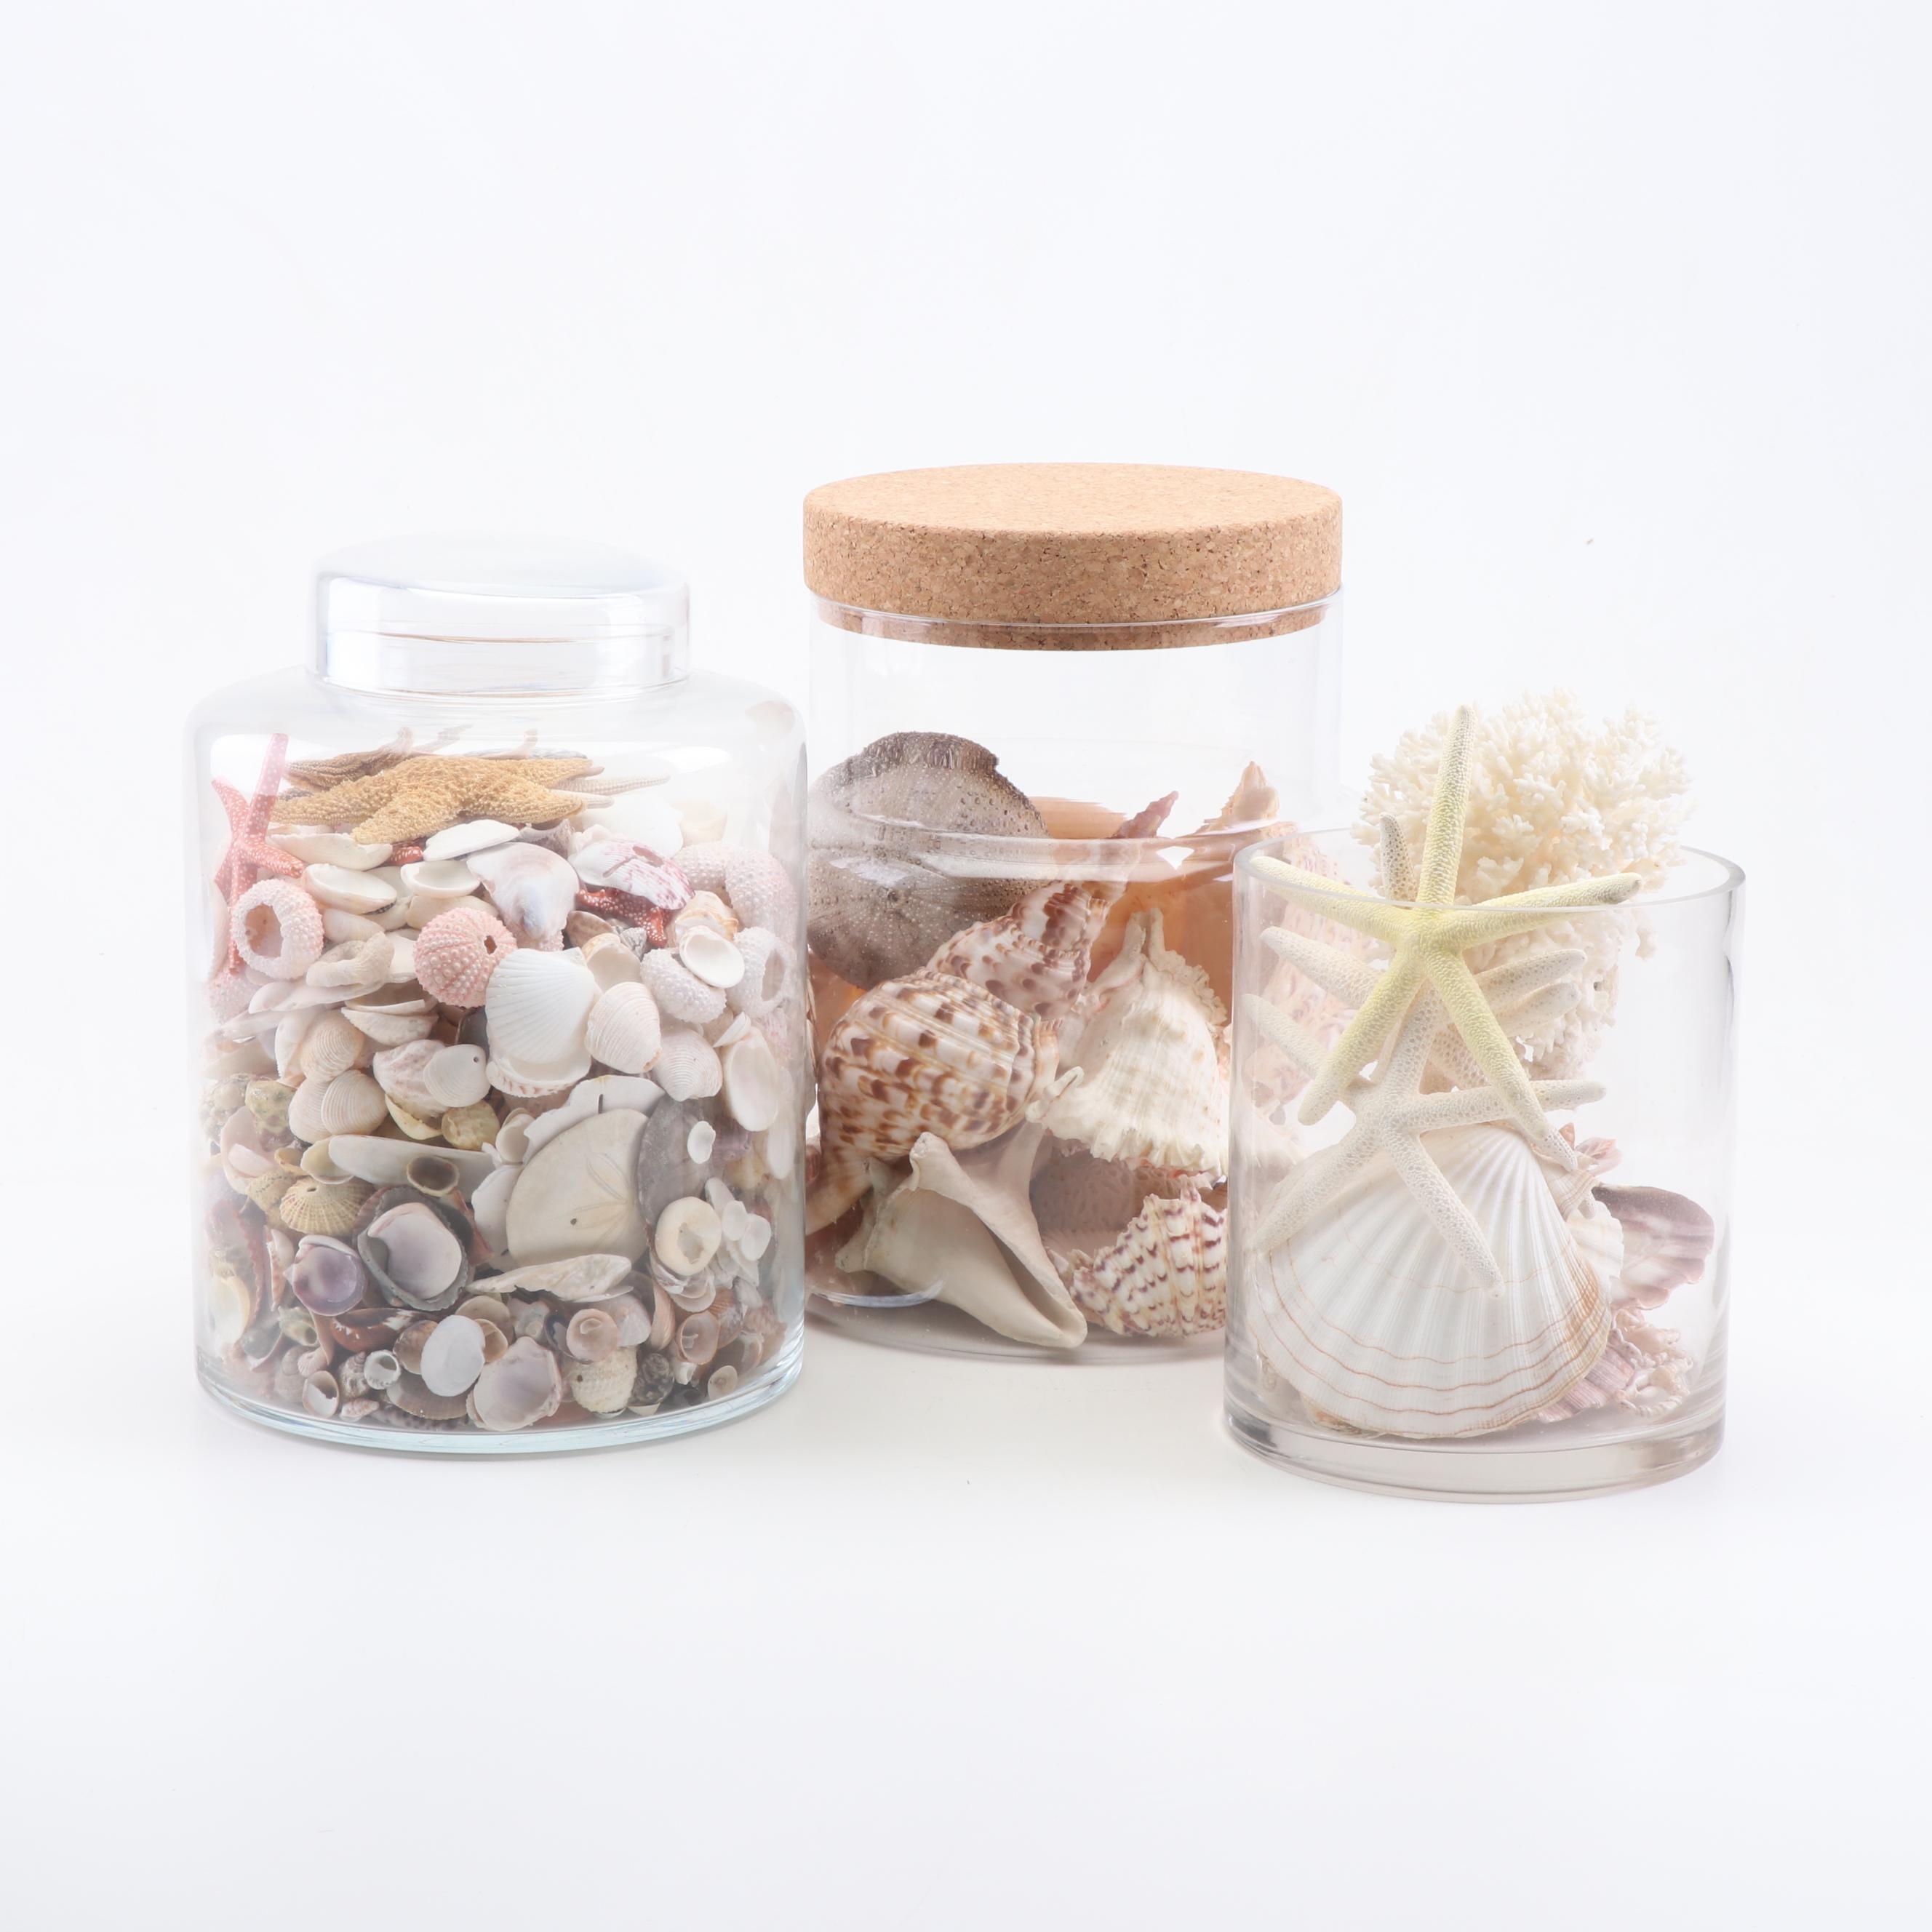 Sea Shells in Glass Jars Table Decor